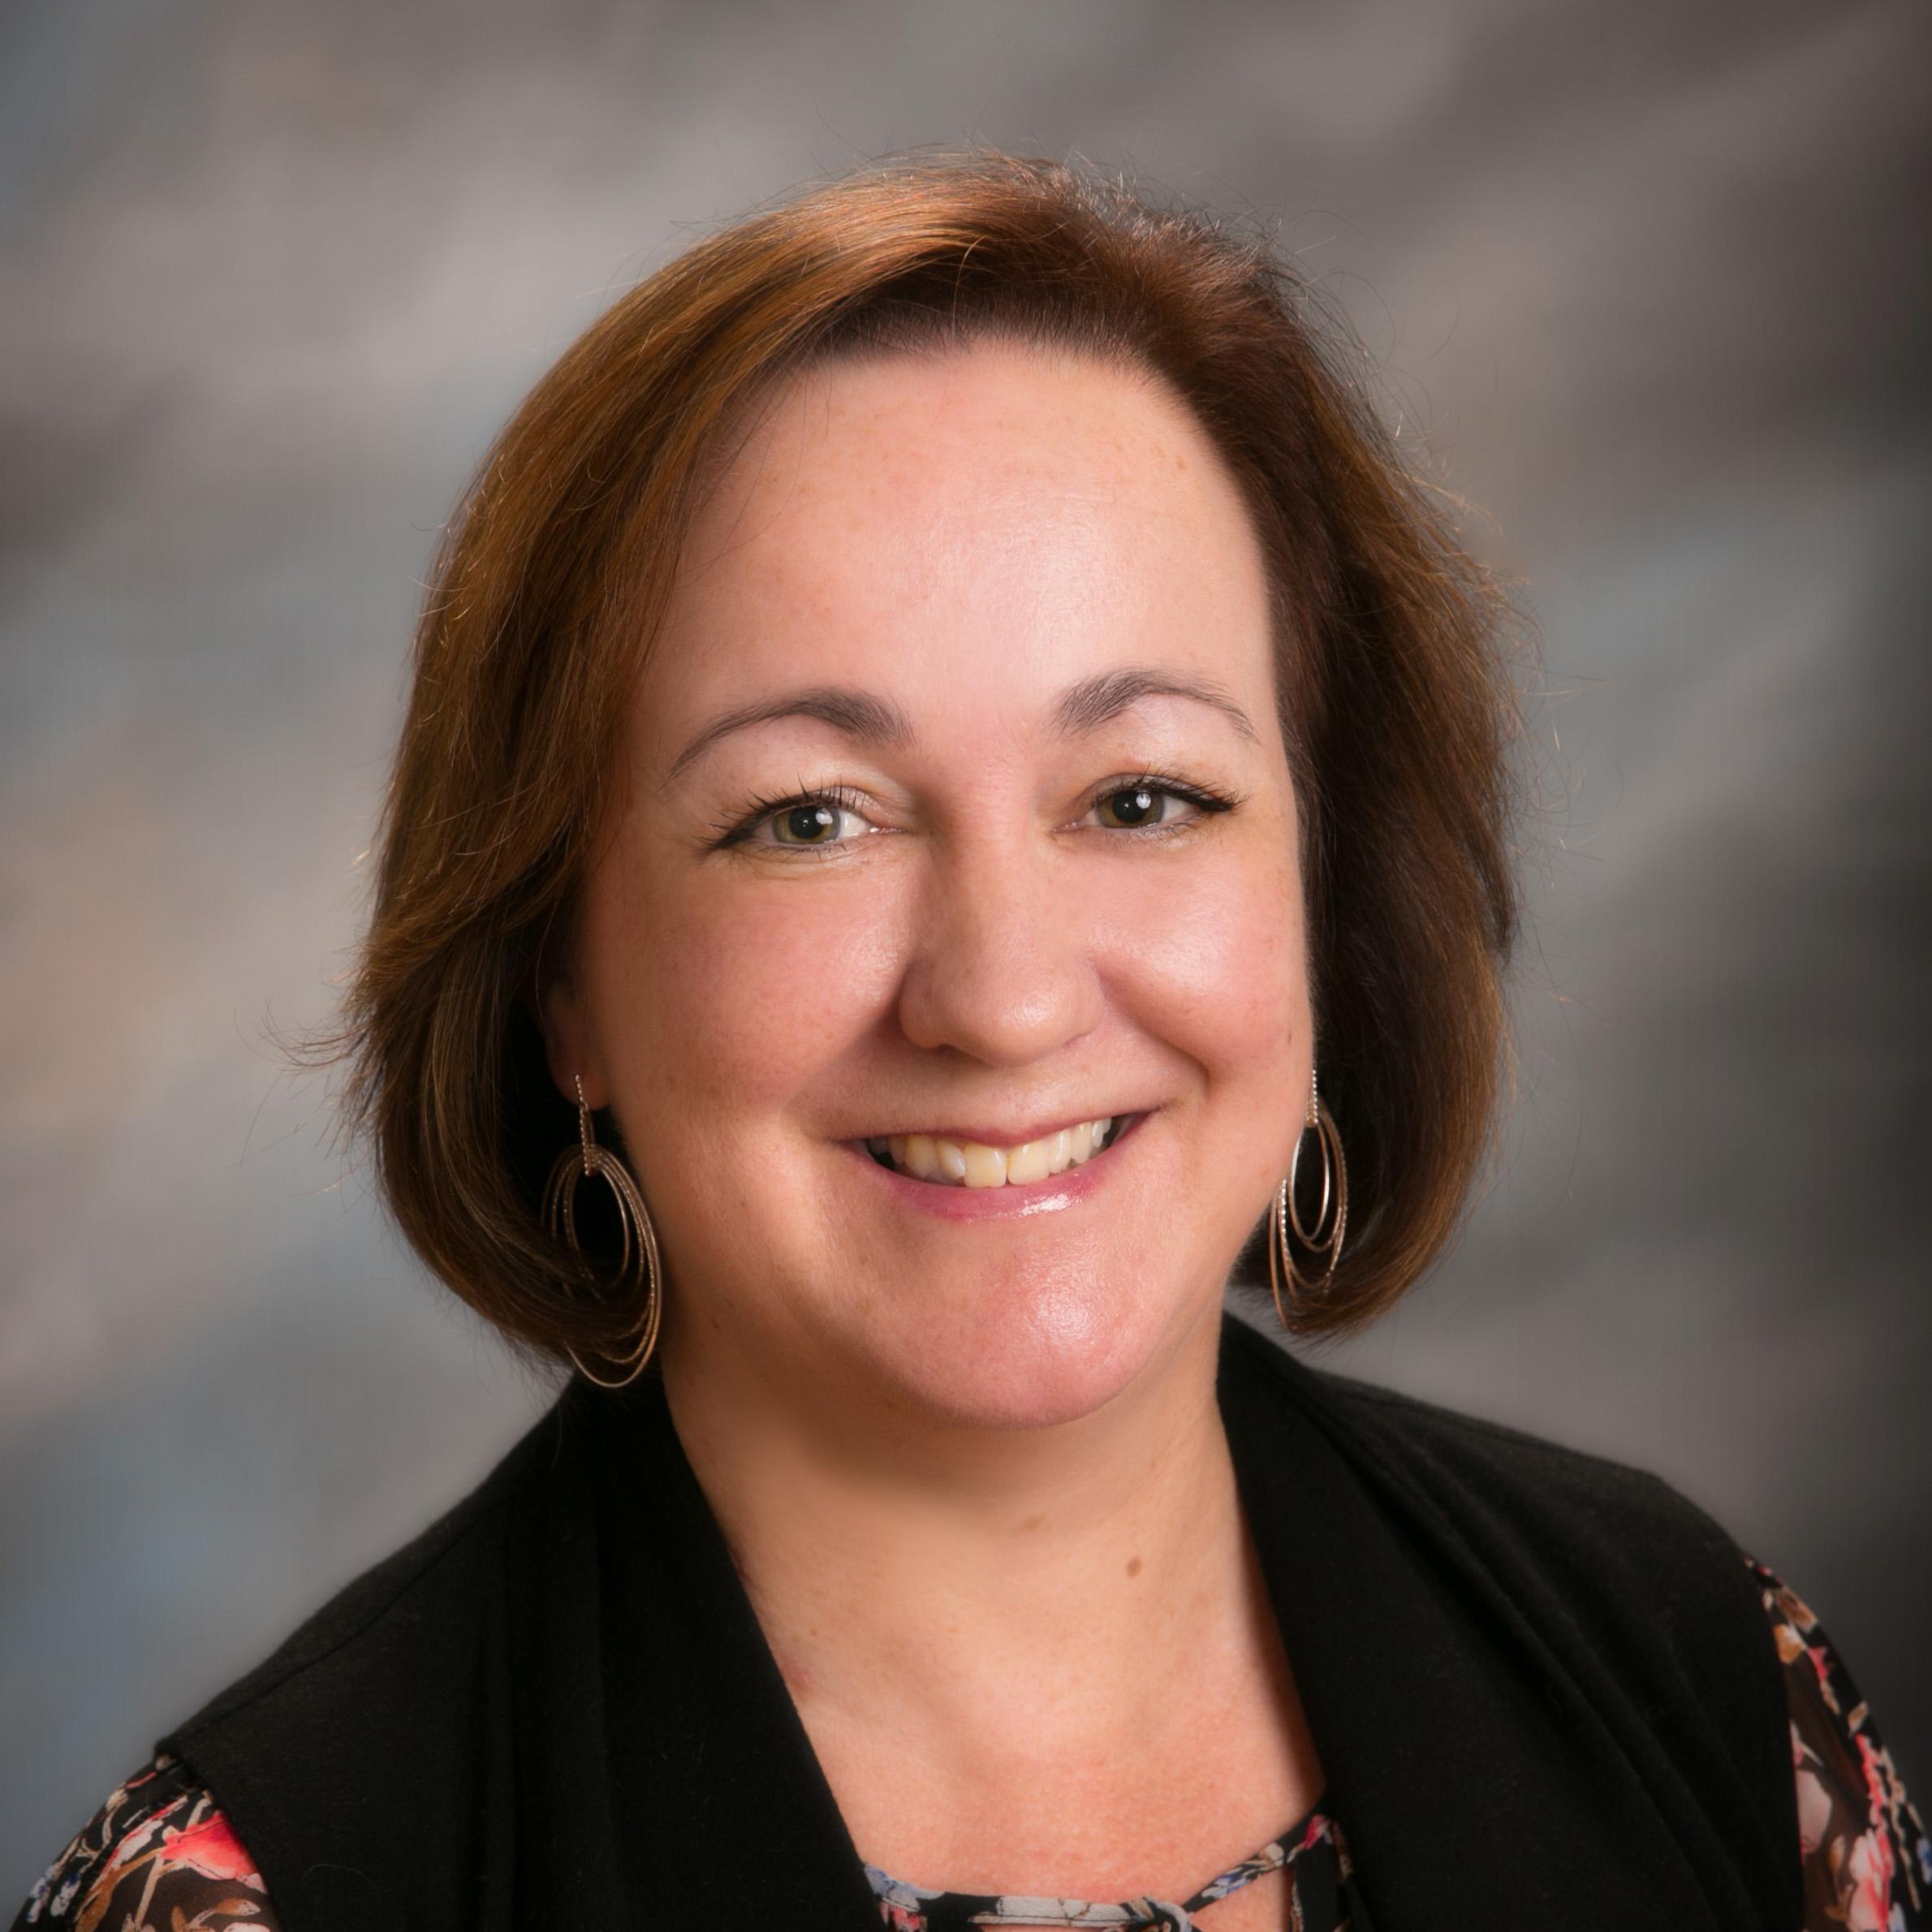 Helen Ede, M.D. | Family Medicine